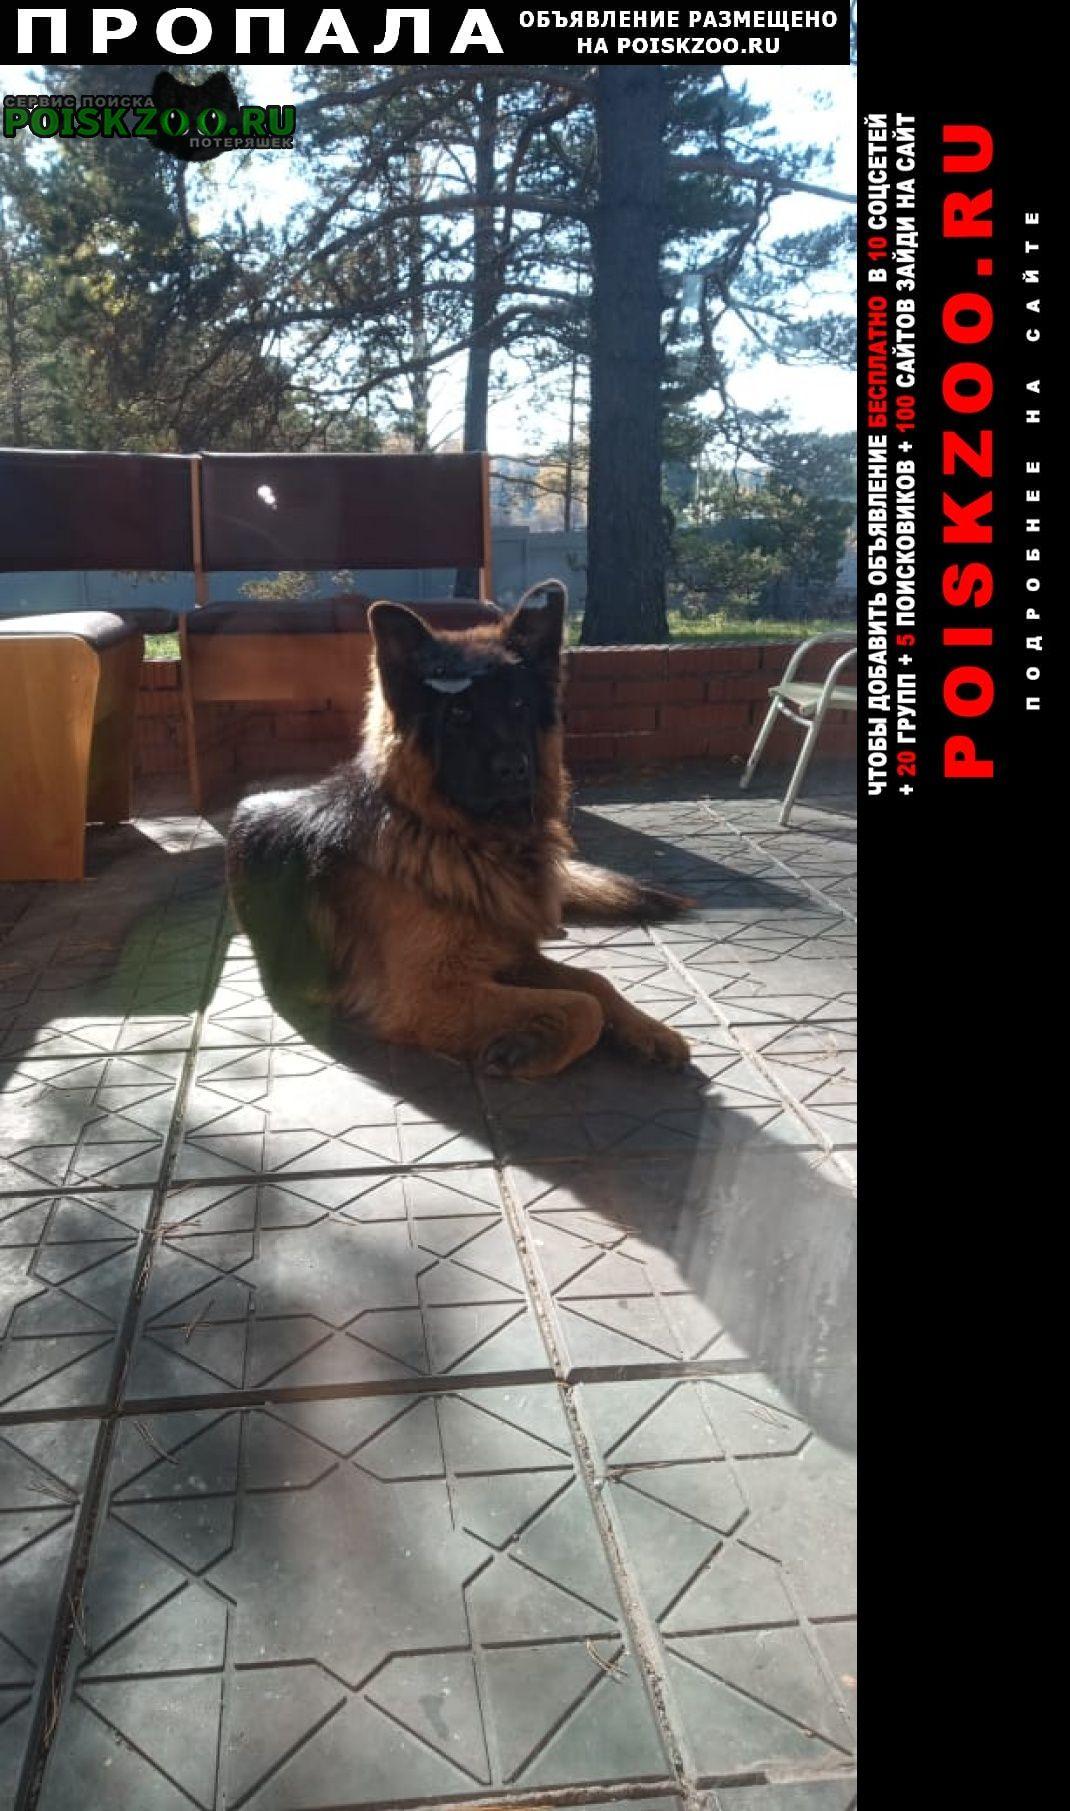 Пропала собака немецкая овчарка Новокузнецк